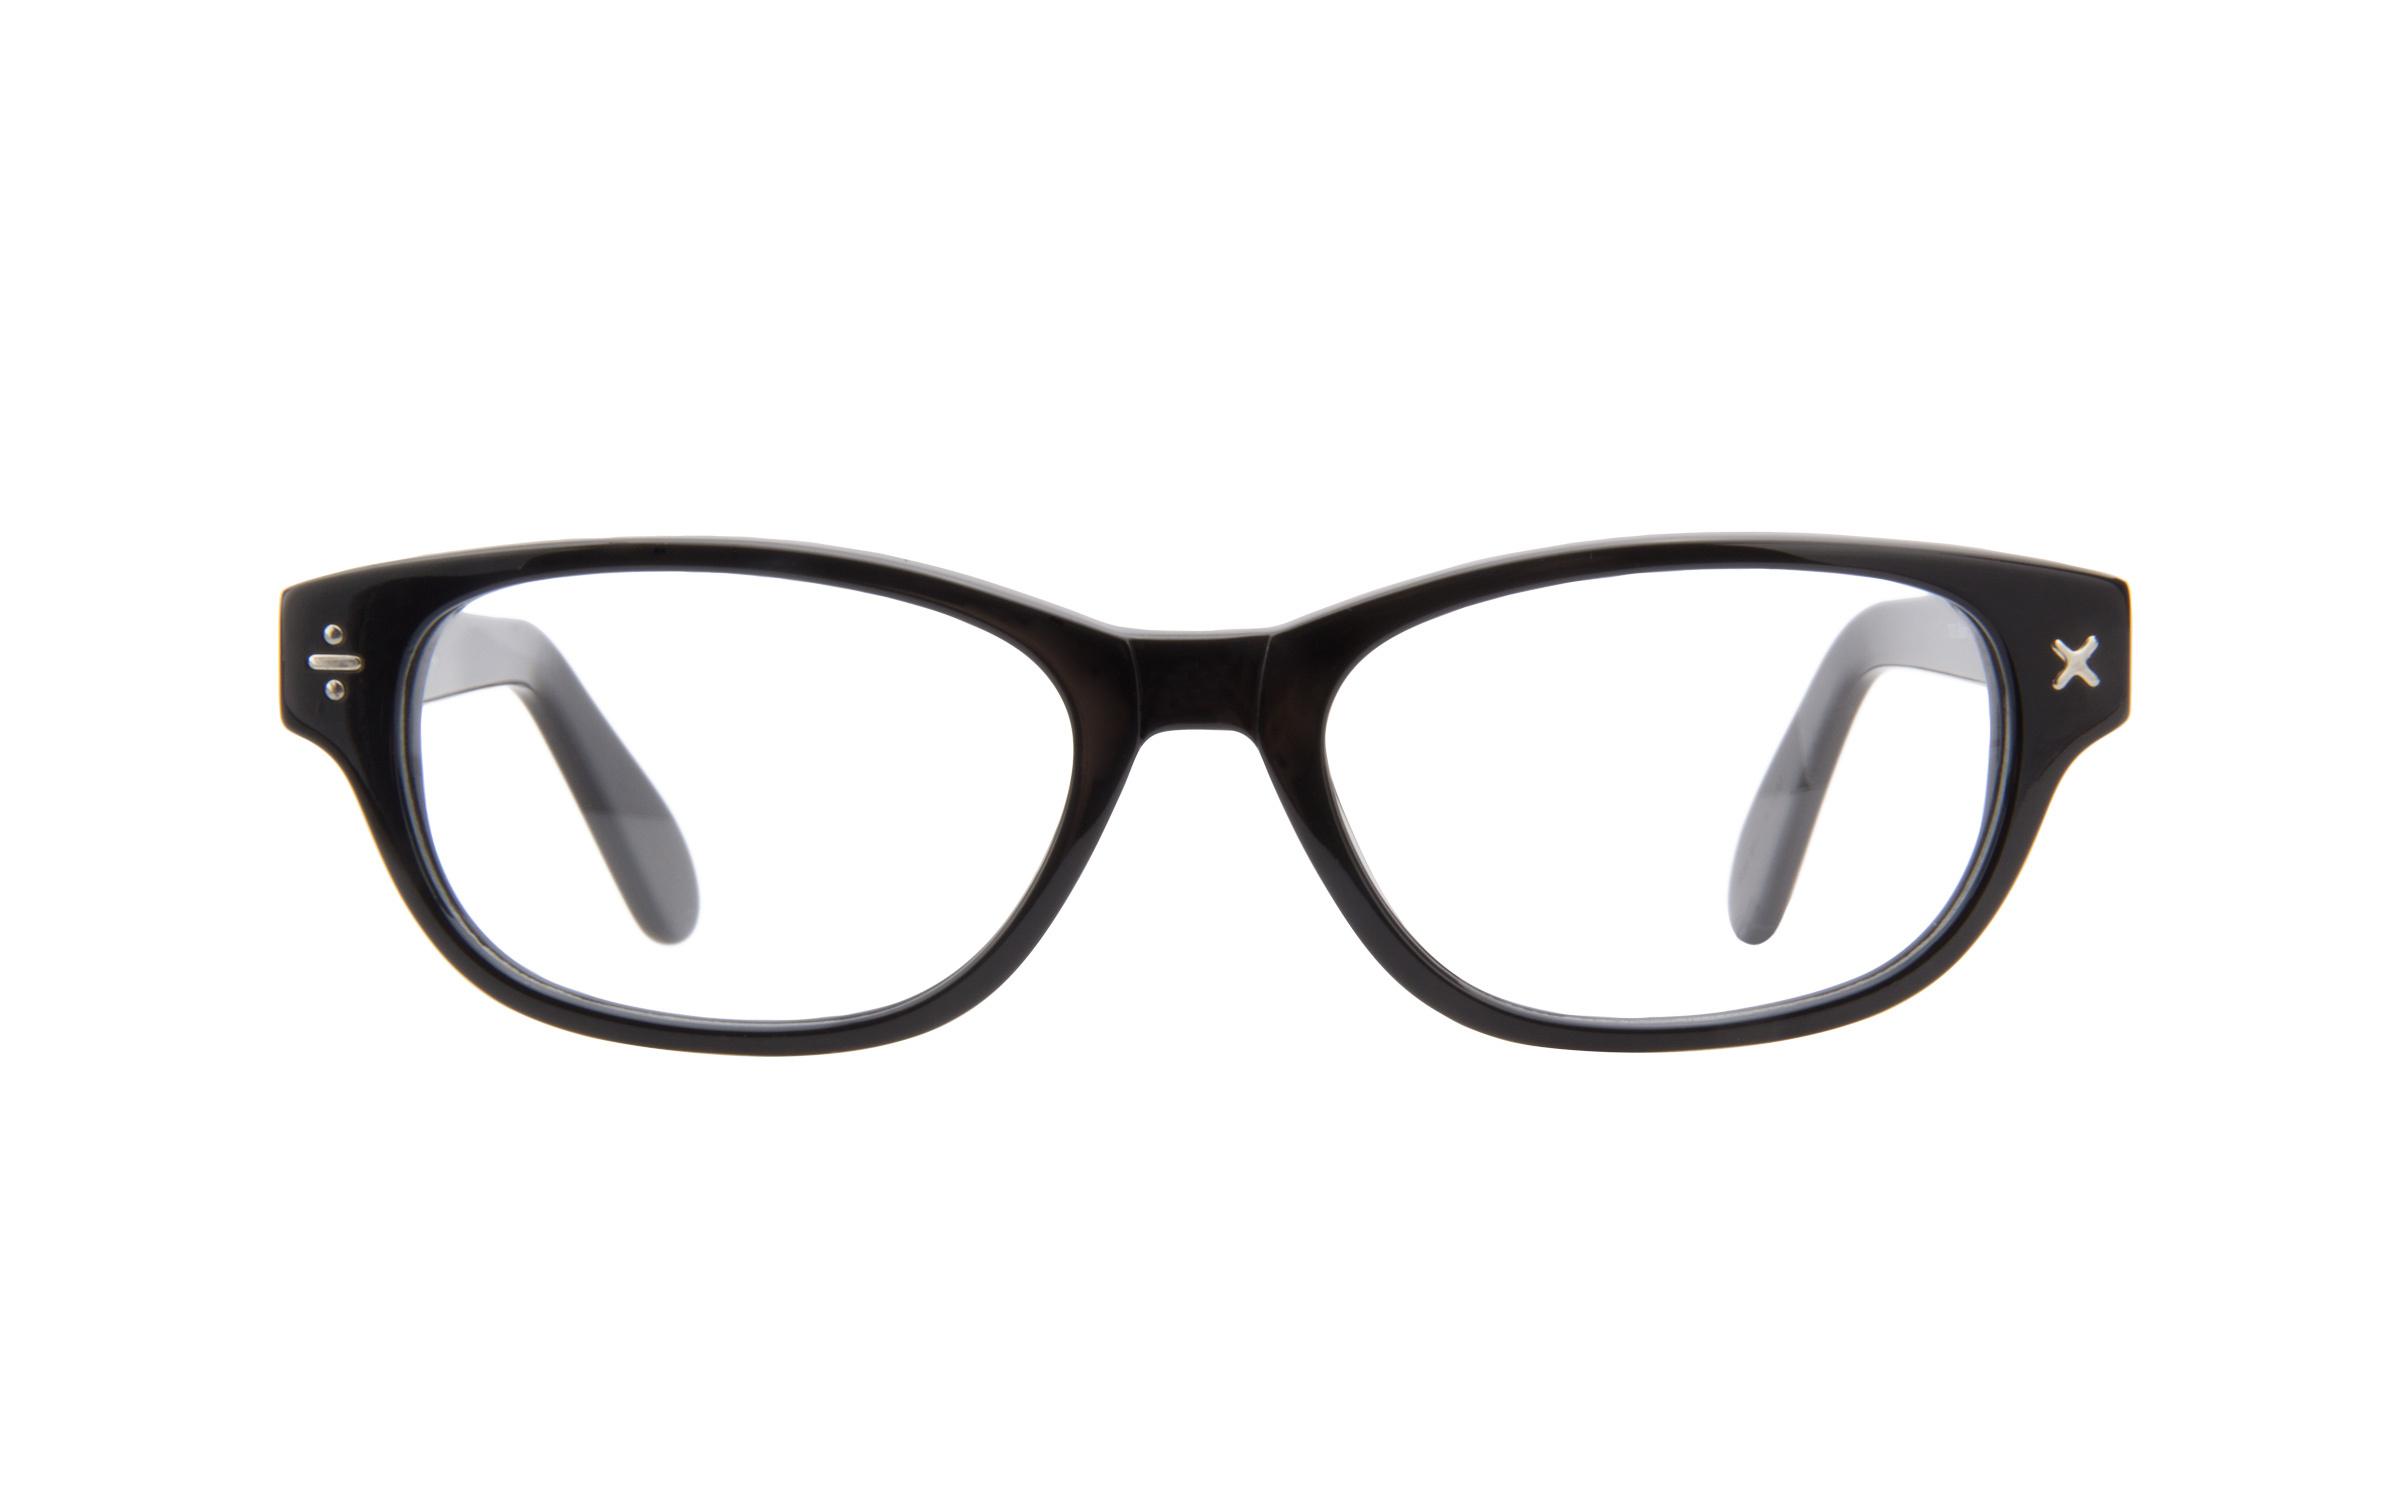 Womens_Oval_Glasses_Black_Derek_Cardigan_Online_Coastal